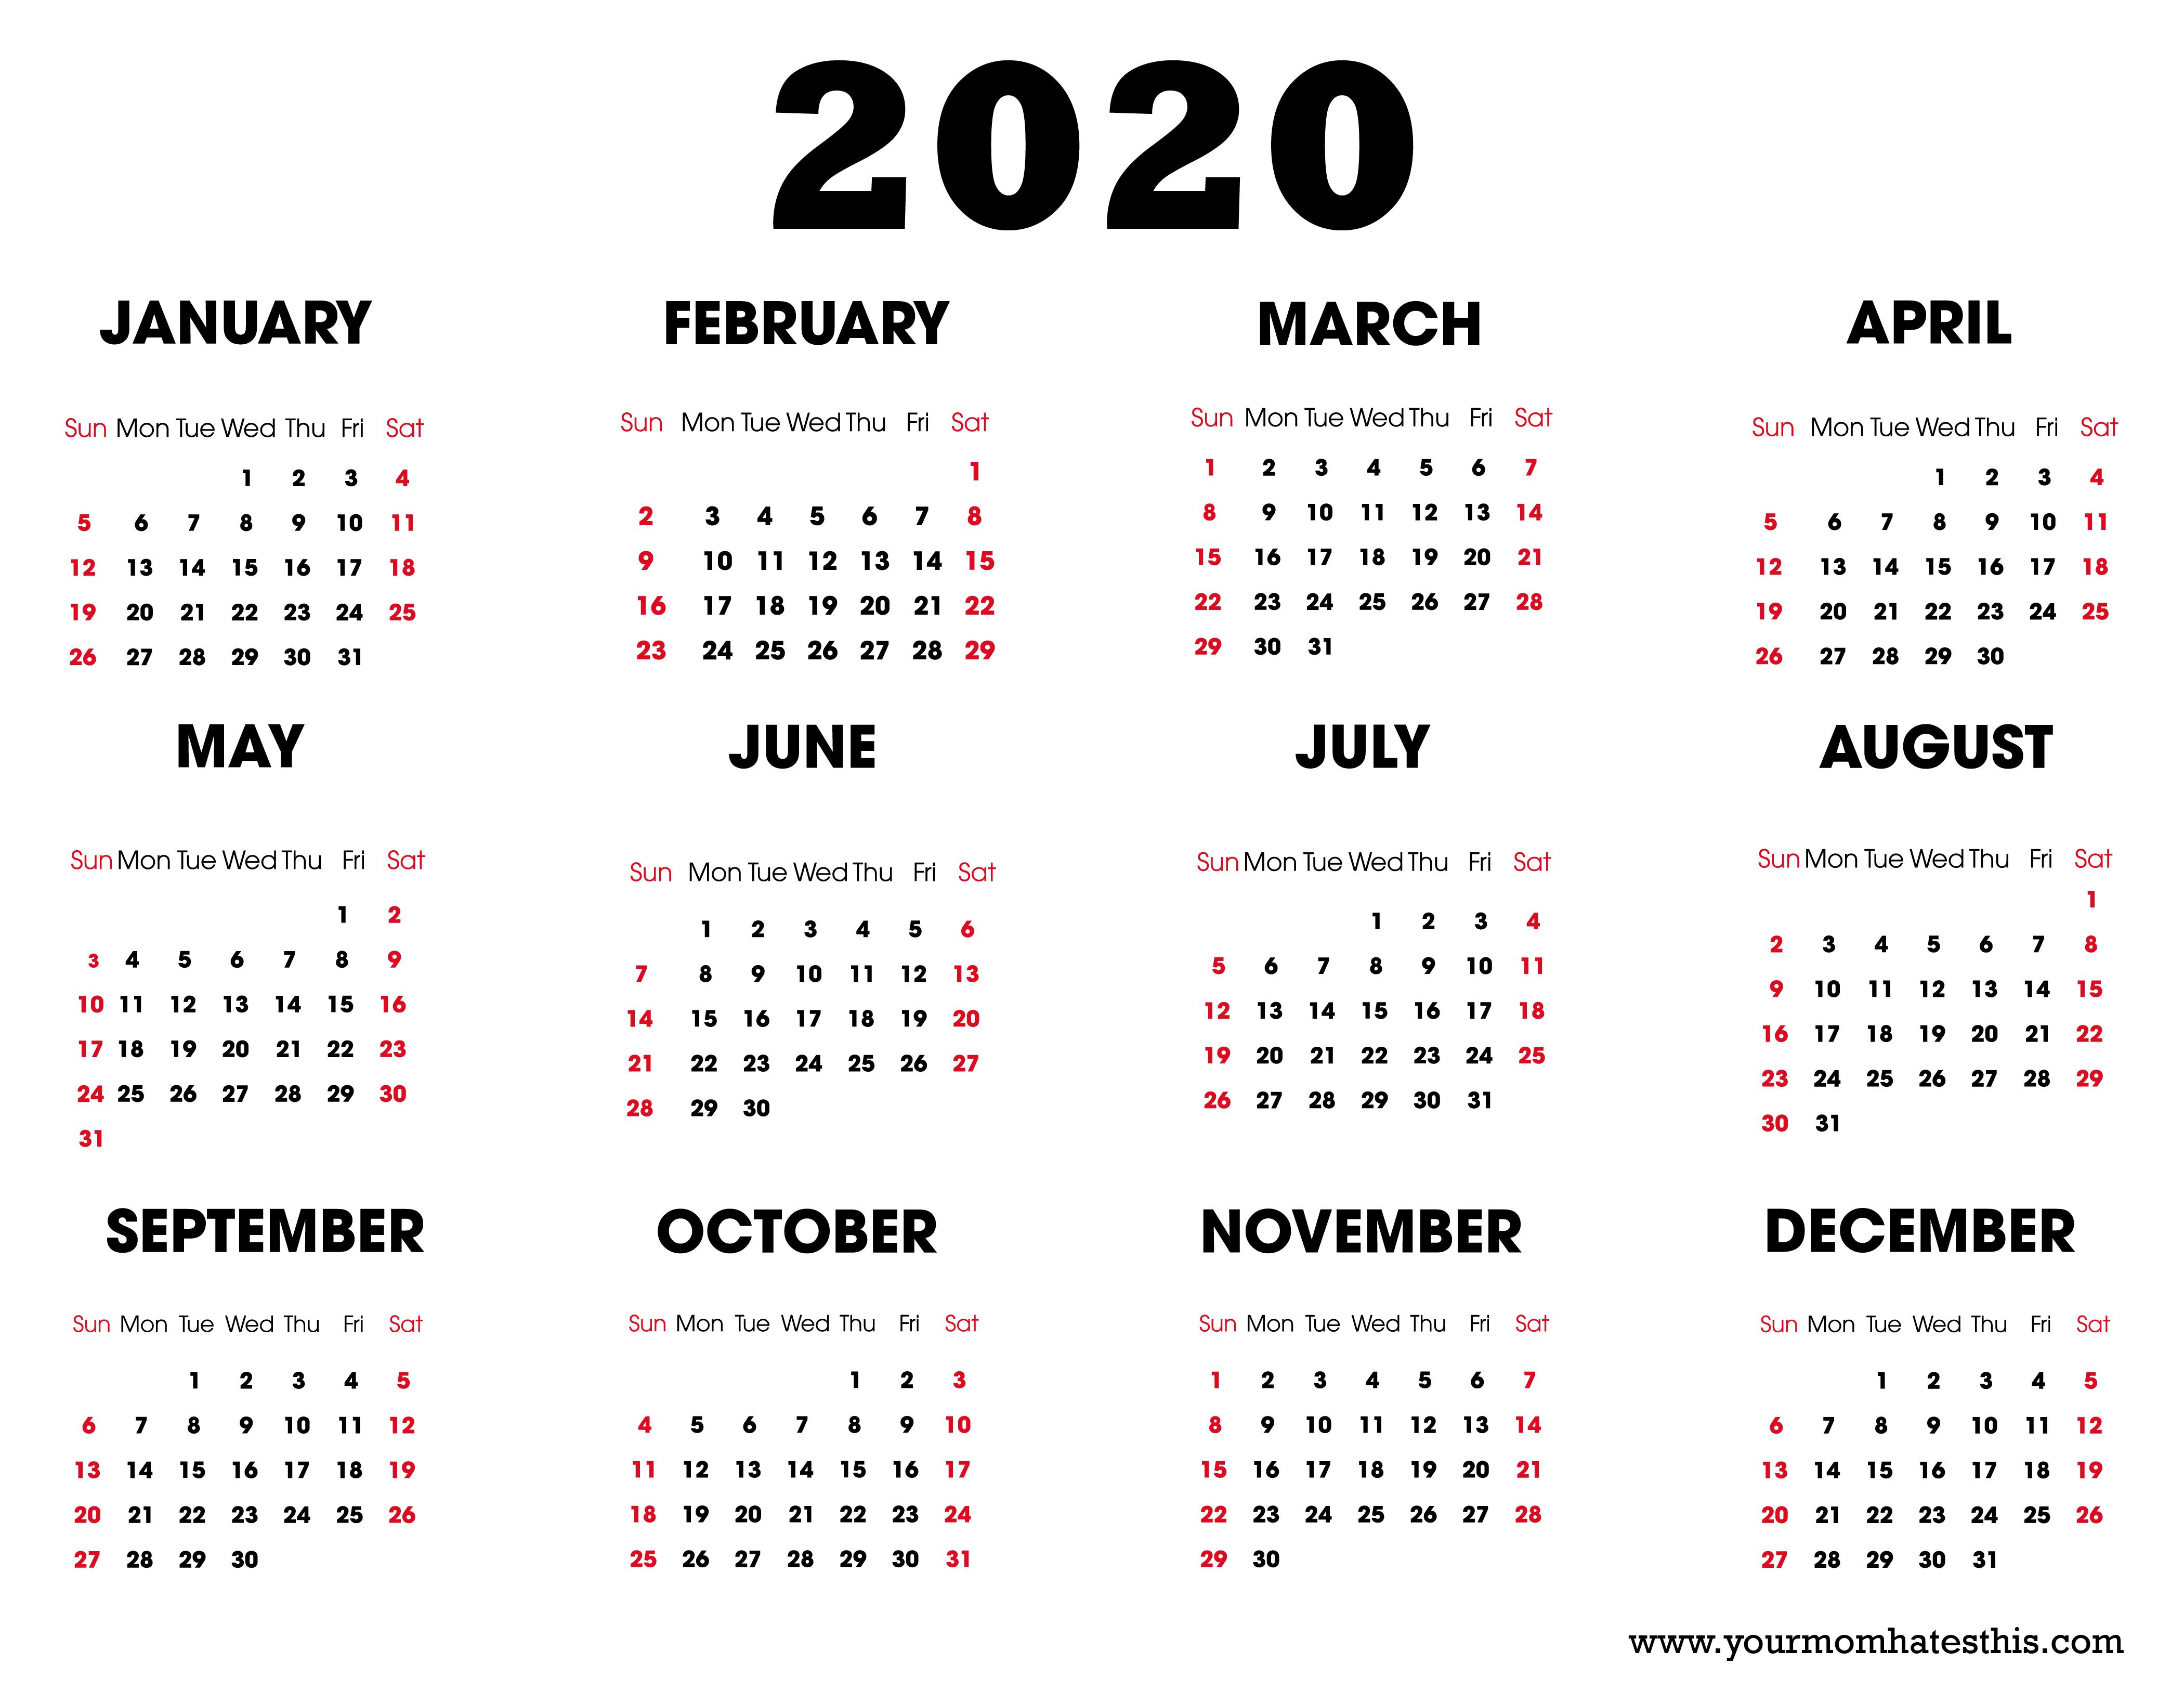 2020 Calendars In Pdf - Download Templates Of Calendar 2020